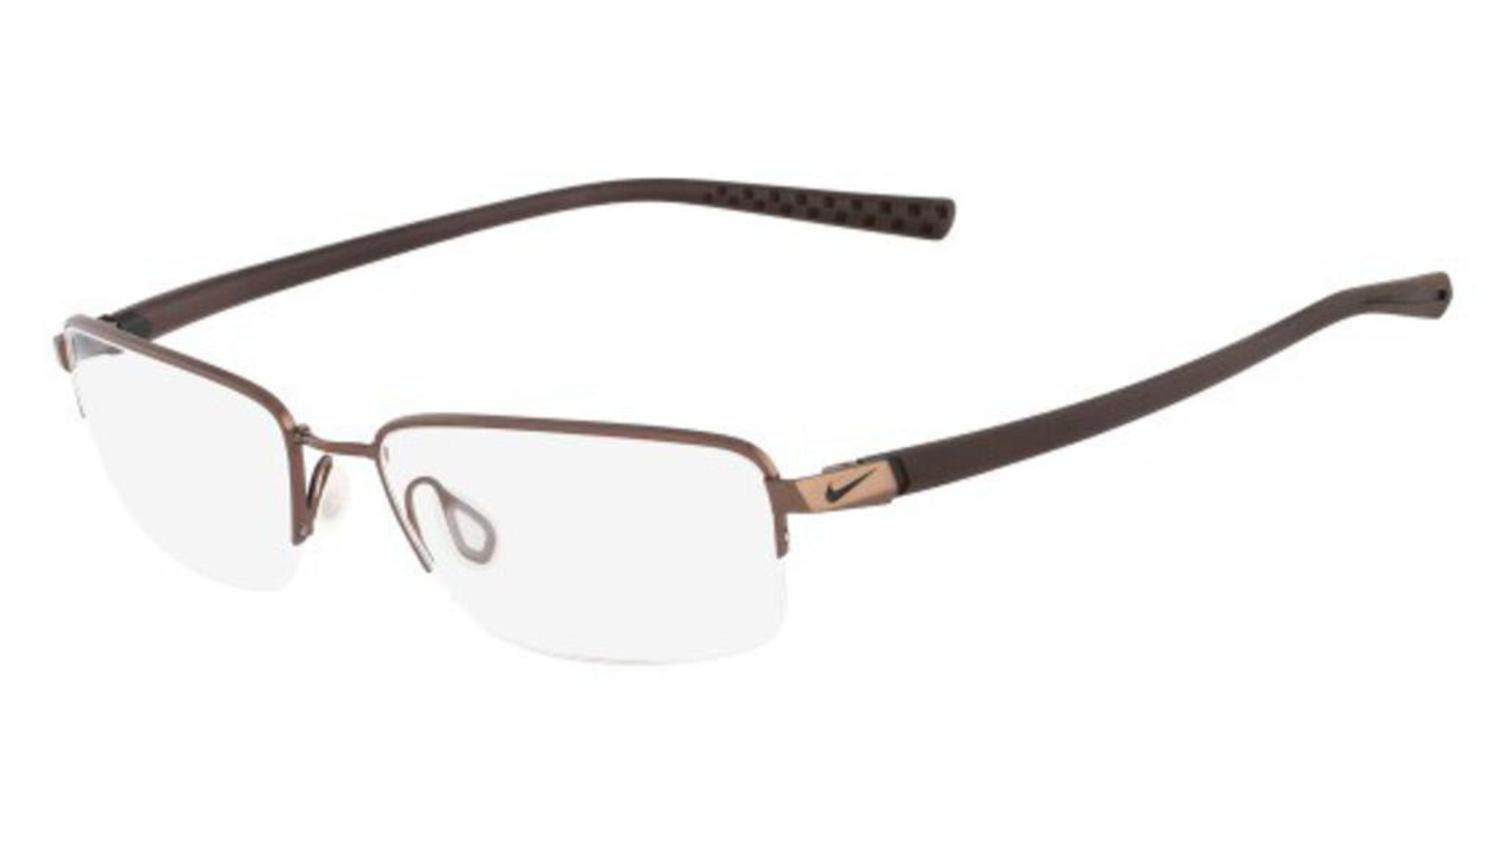 Nike Eyeglasses 4214 242 Wal/Drk Brwn Demo 53 18 by NIKE